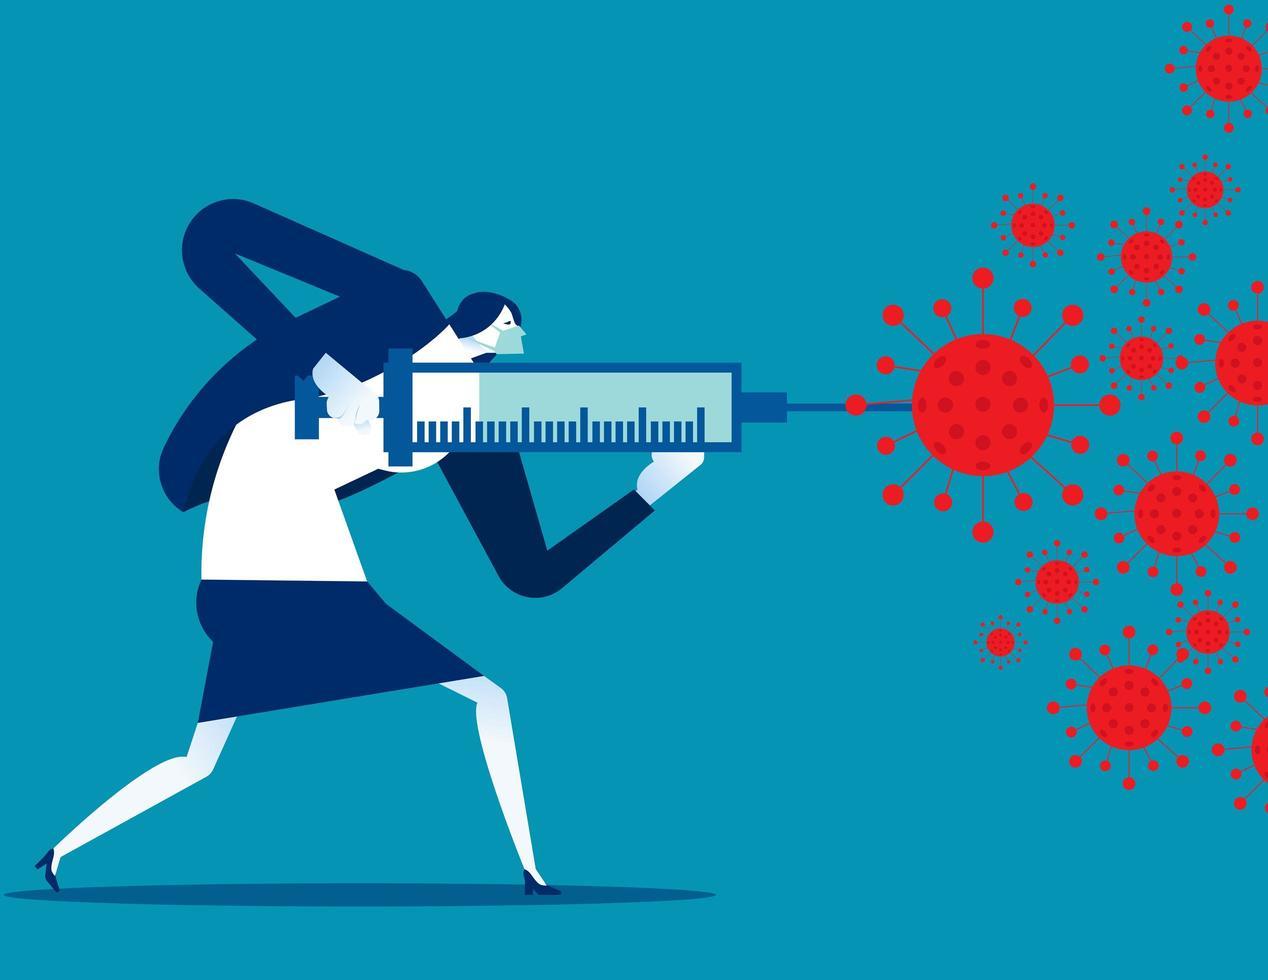 femme avec vaccin fghting covid 19 vecteur